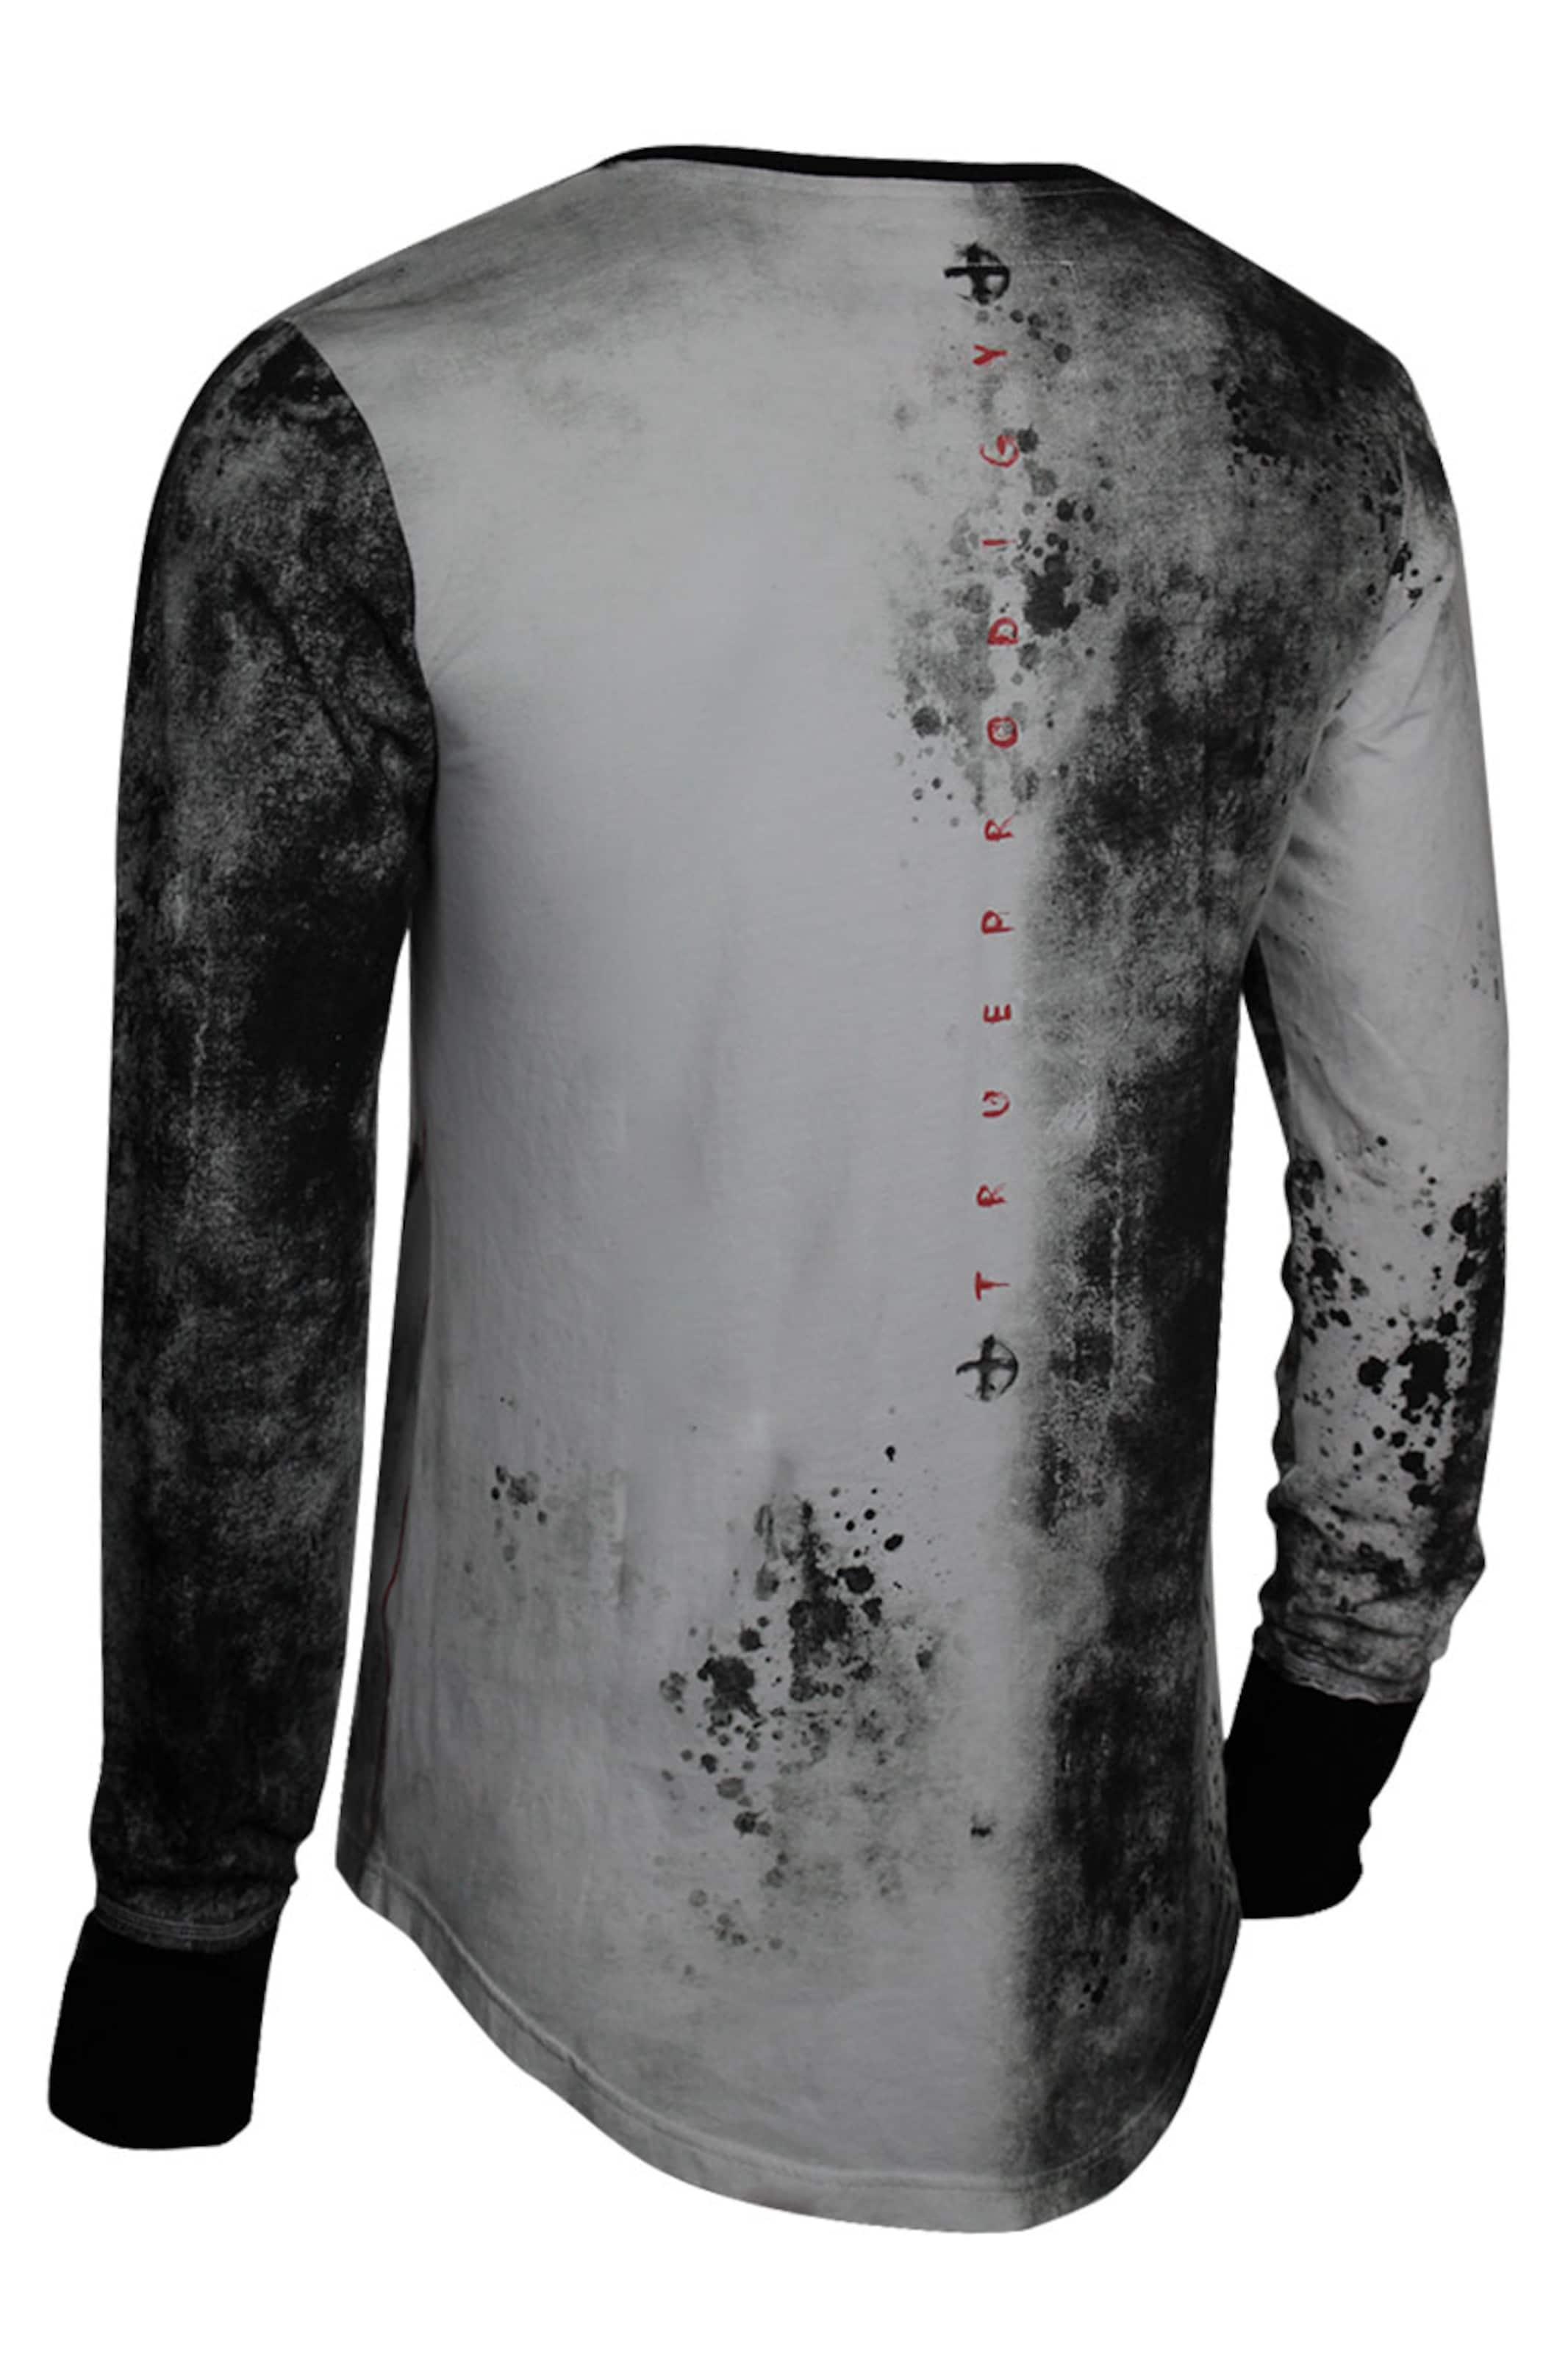 RotSchwarz Shirt In Trueprodigy In Trueprodigy RotSchwarz Shirt Weiß yvmwO08Nn